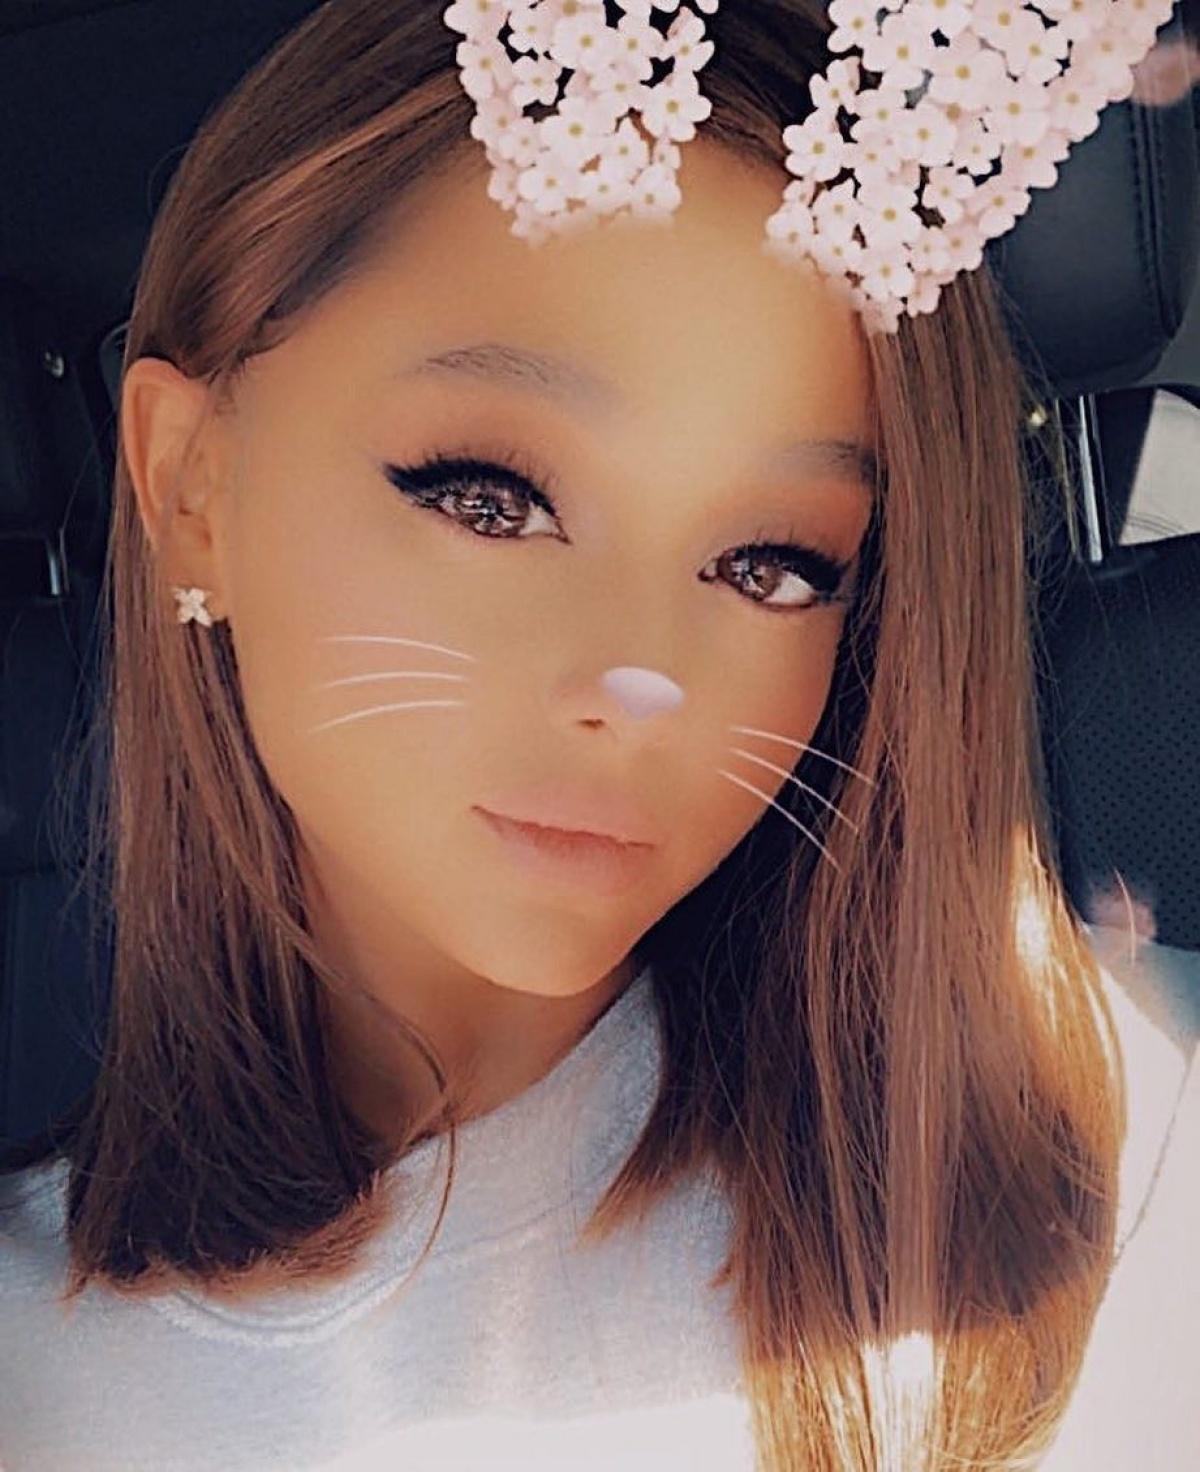 Ariana Grande Posts Rare Photo Of Her Natural Short Hair Reality